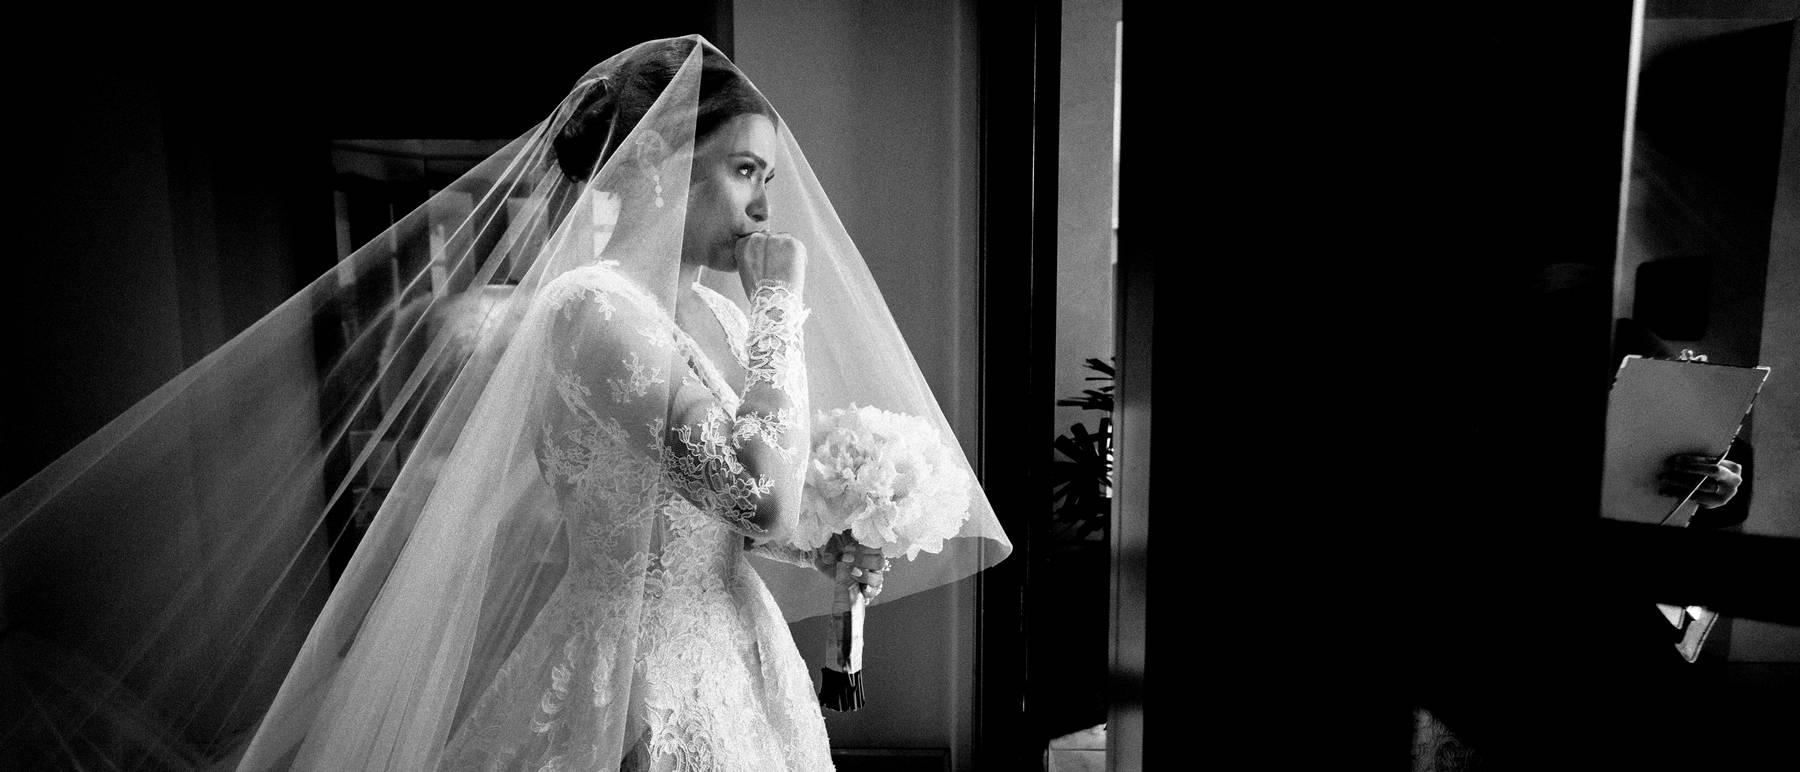 johnandjoseph-wedding-photographer-hz-slider-237